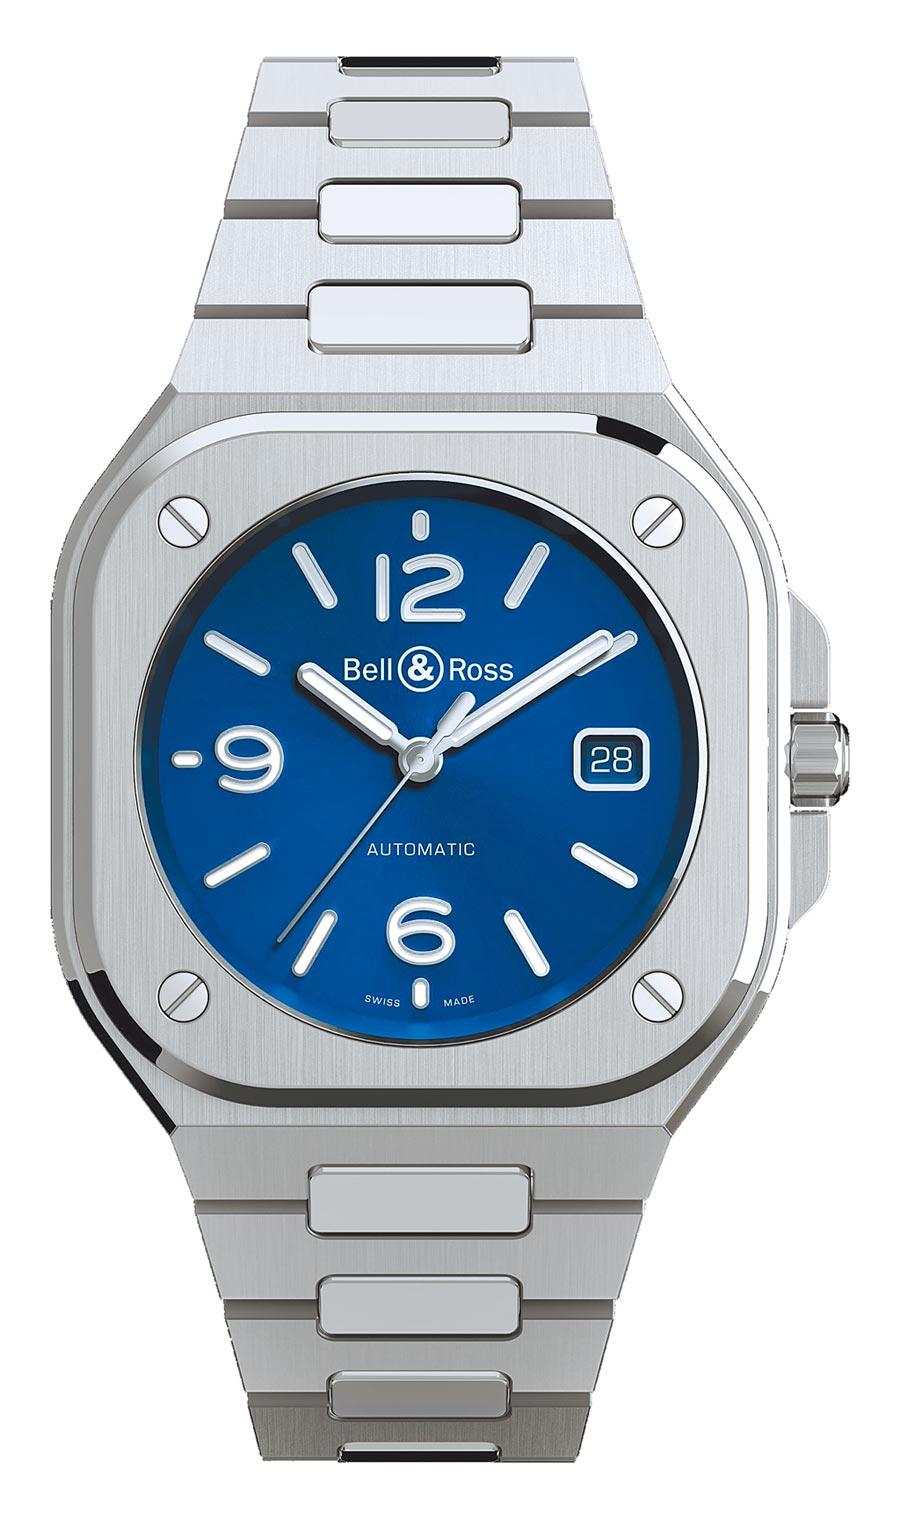 Bell & Ross年度力作BR05不鏽鋼海軍藍表盤腕表,16萬8000元。(Bell & Ross提供)